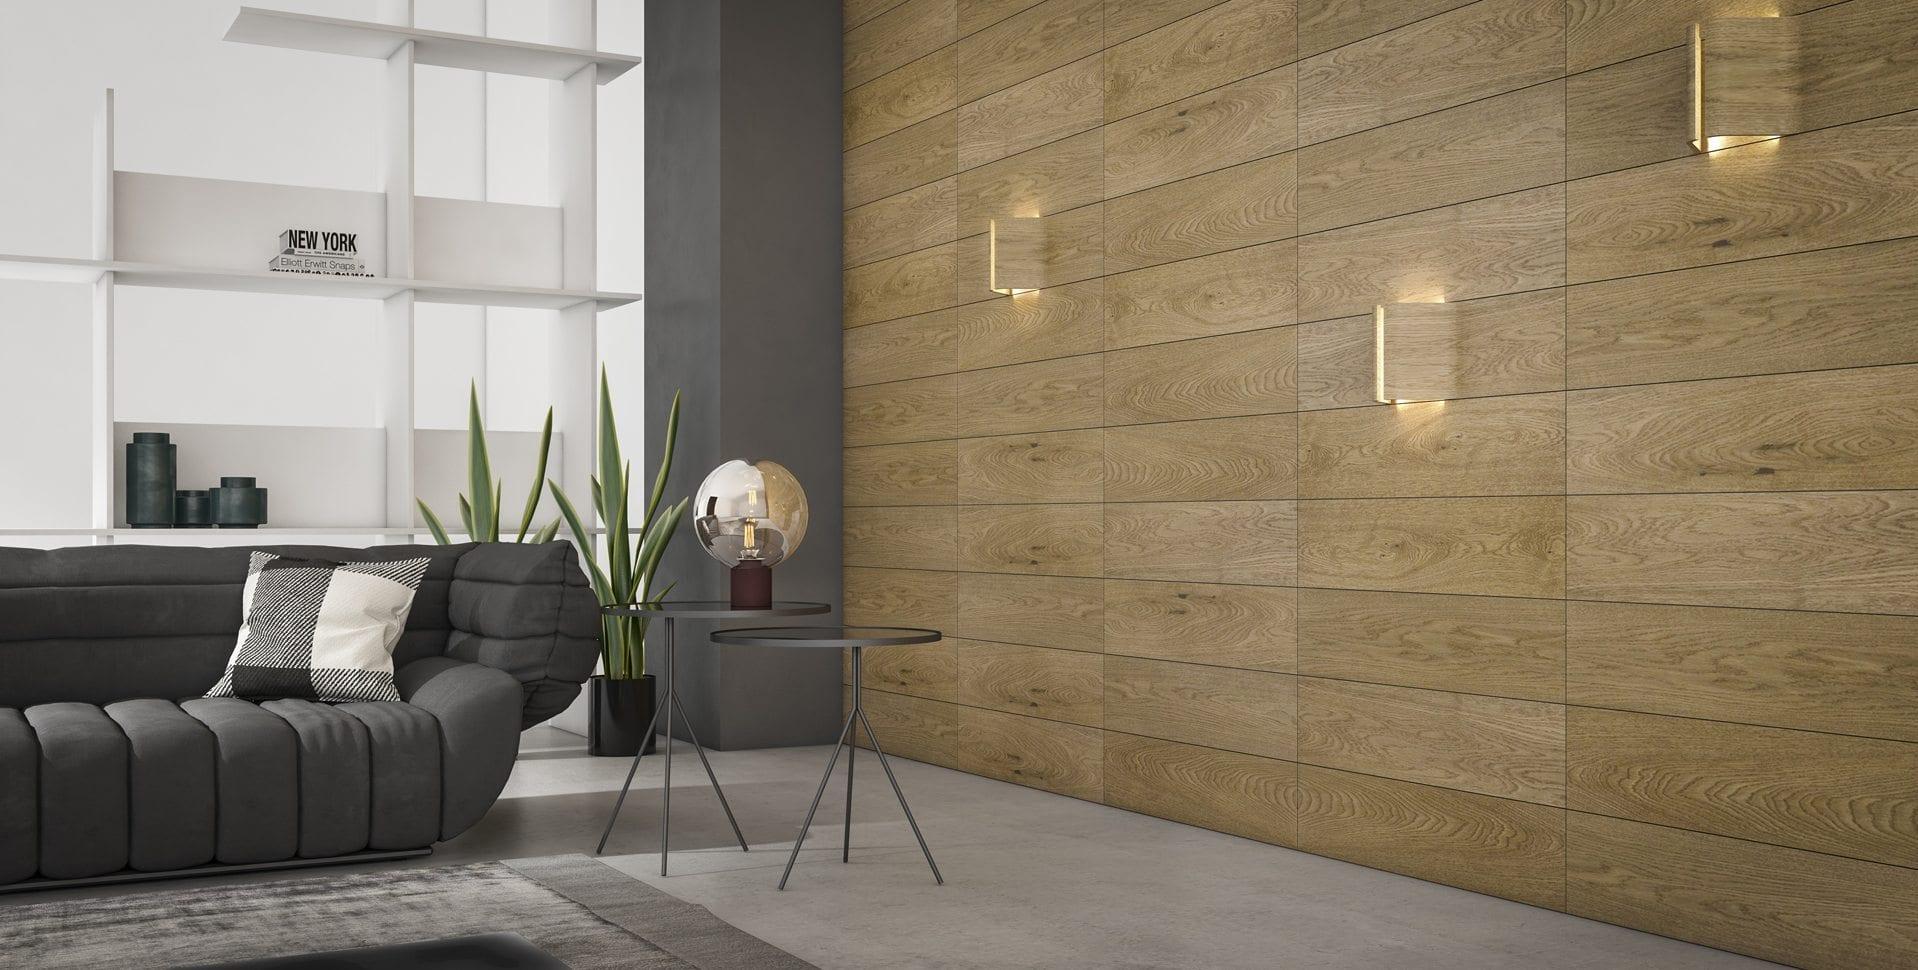 Maayan-Golan_Architectural-Visualization_product-visualization_wall-tiles_lighting-fixture_itai-bar-on_living-room_13